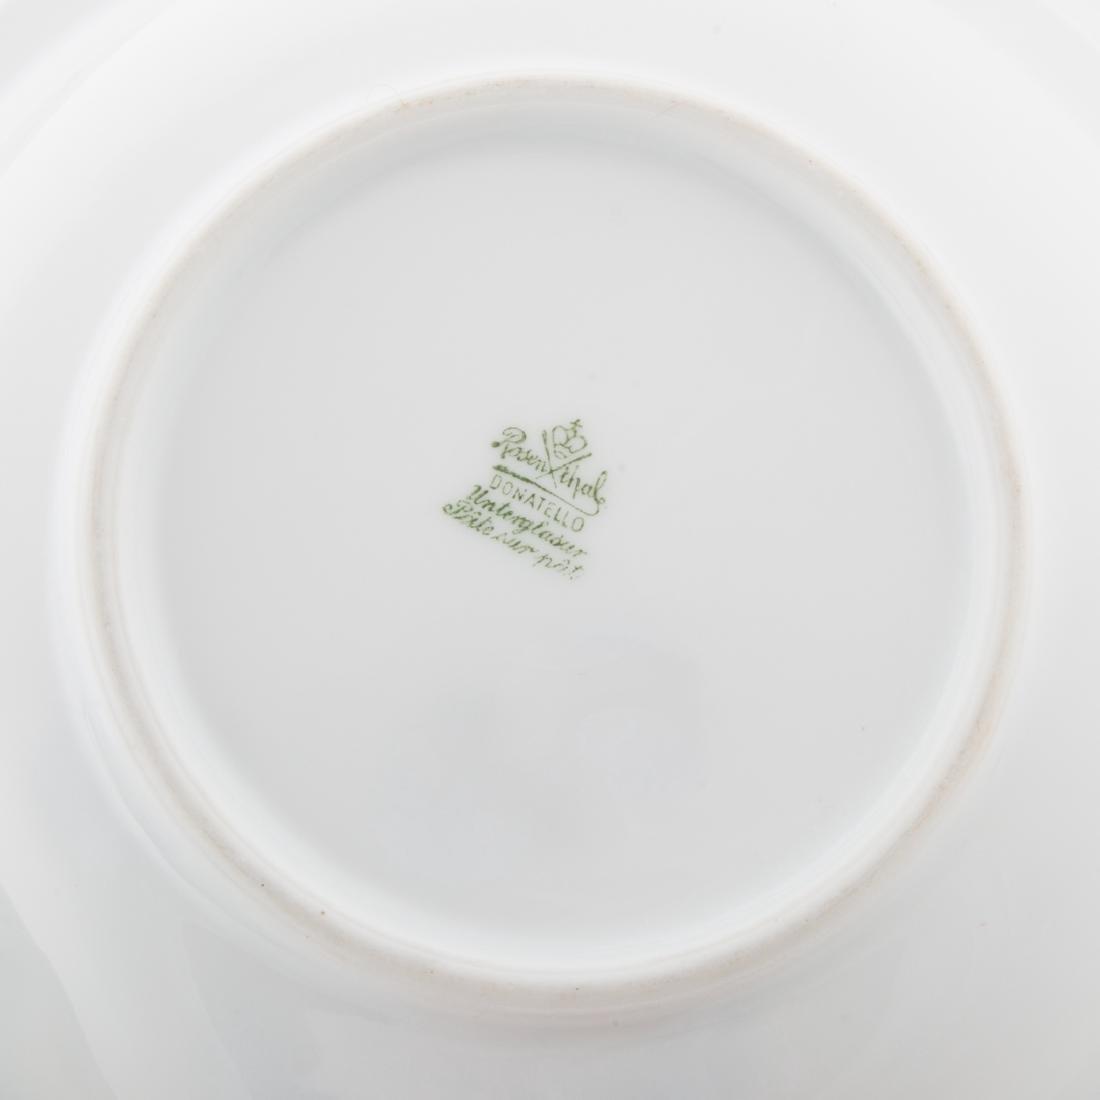 9 pcs. Rosenthal Pate-sur-Pate Donatello porcelain - 5